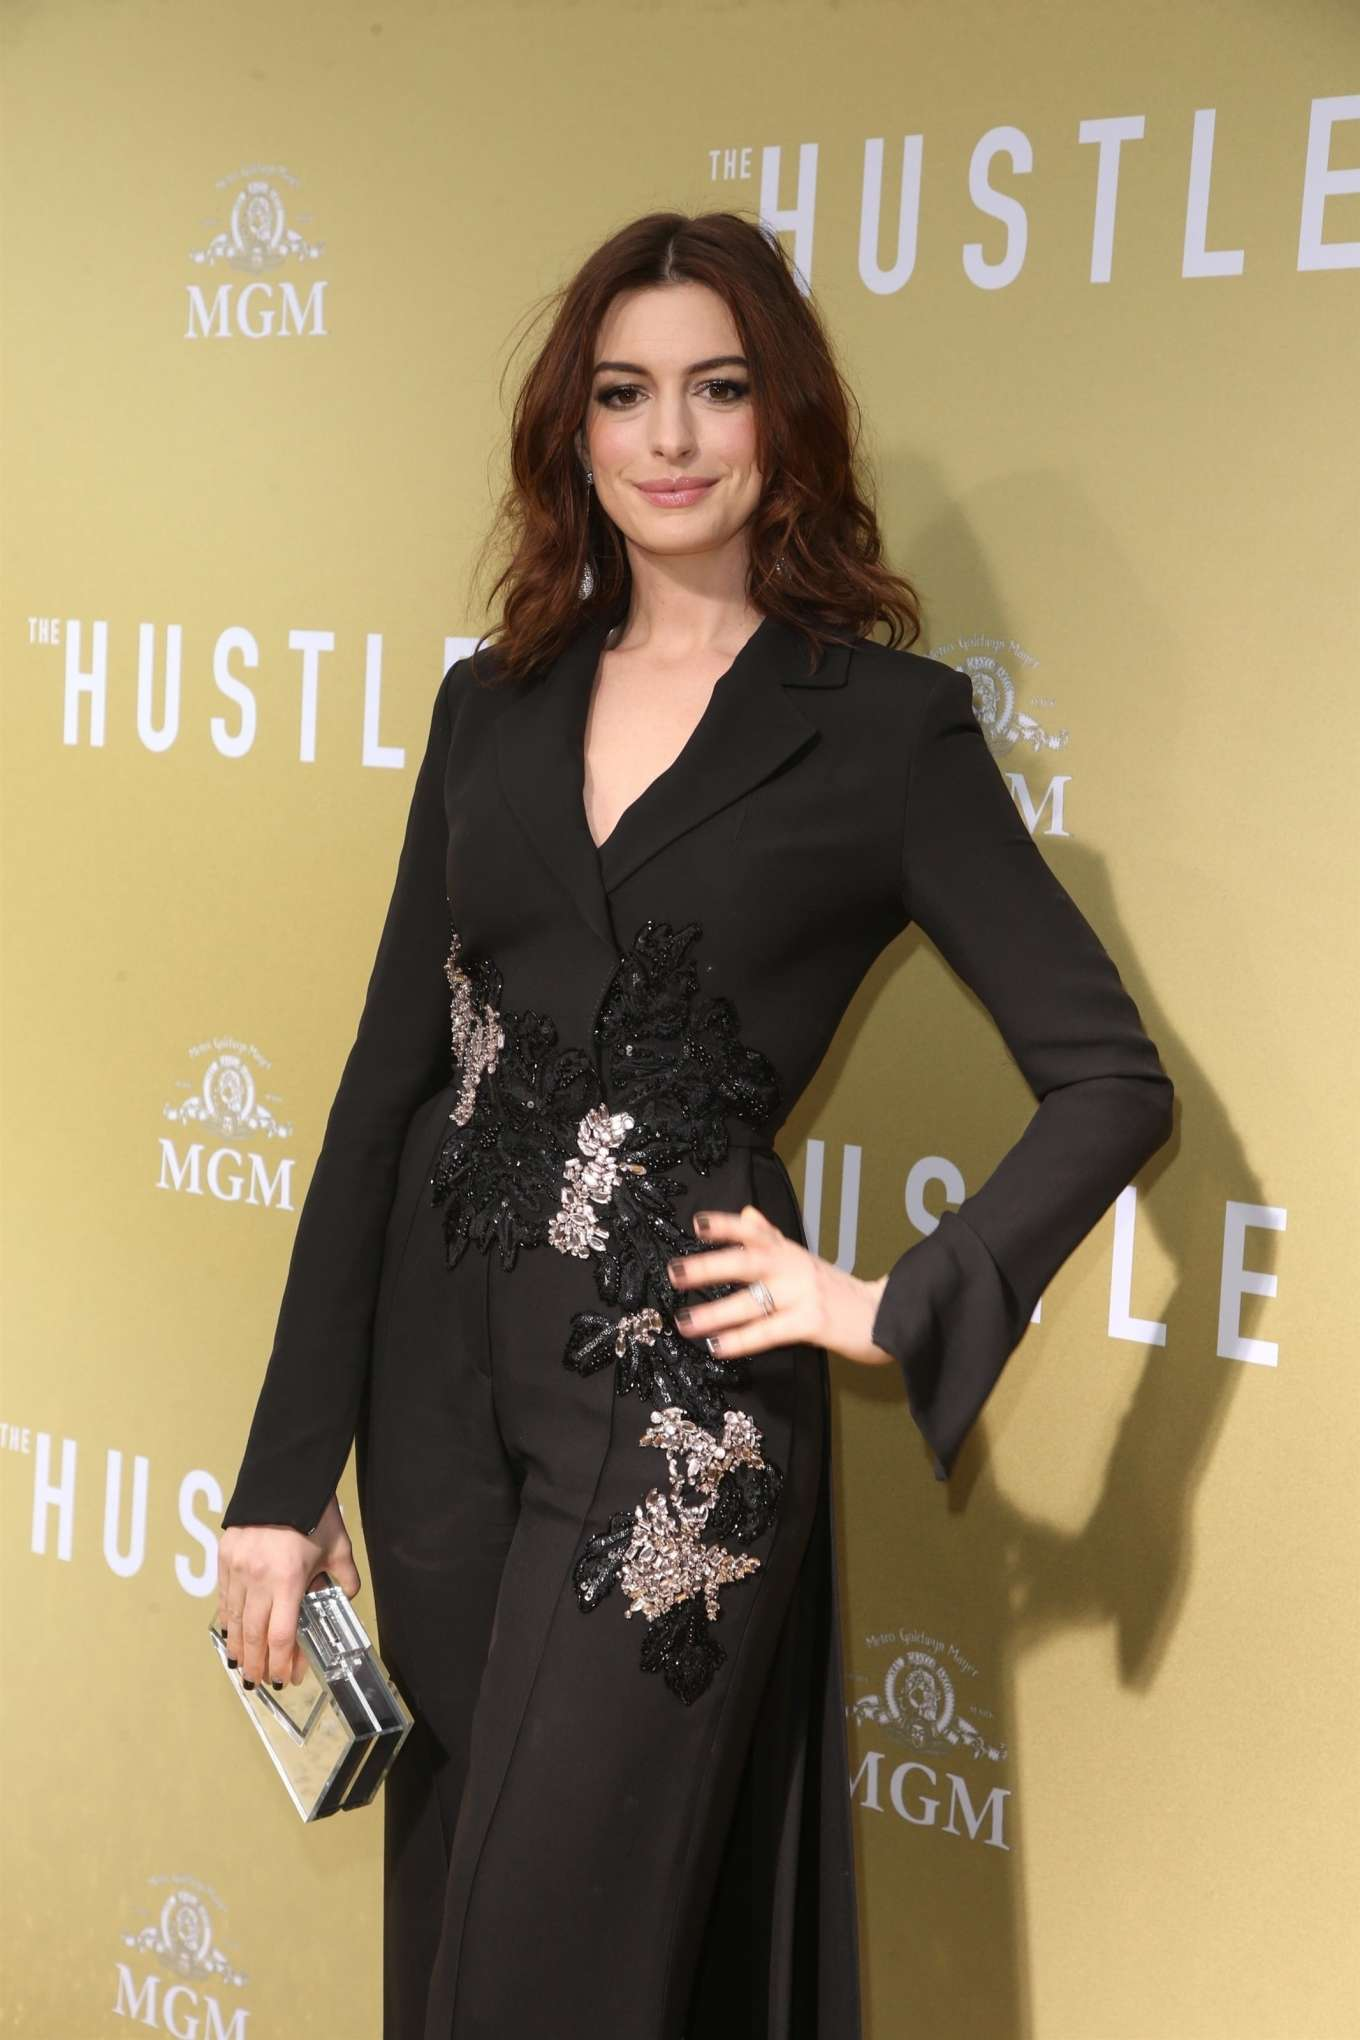 Anne Hathaway 2019 : Anne Hathaway: The Hustle LA Premiere -05